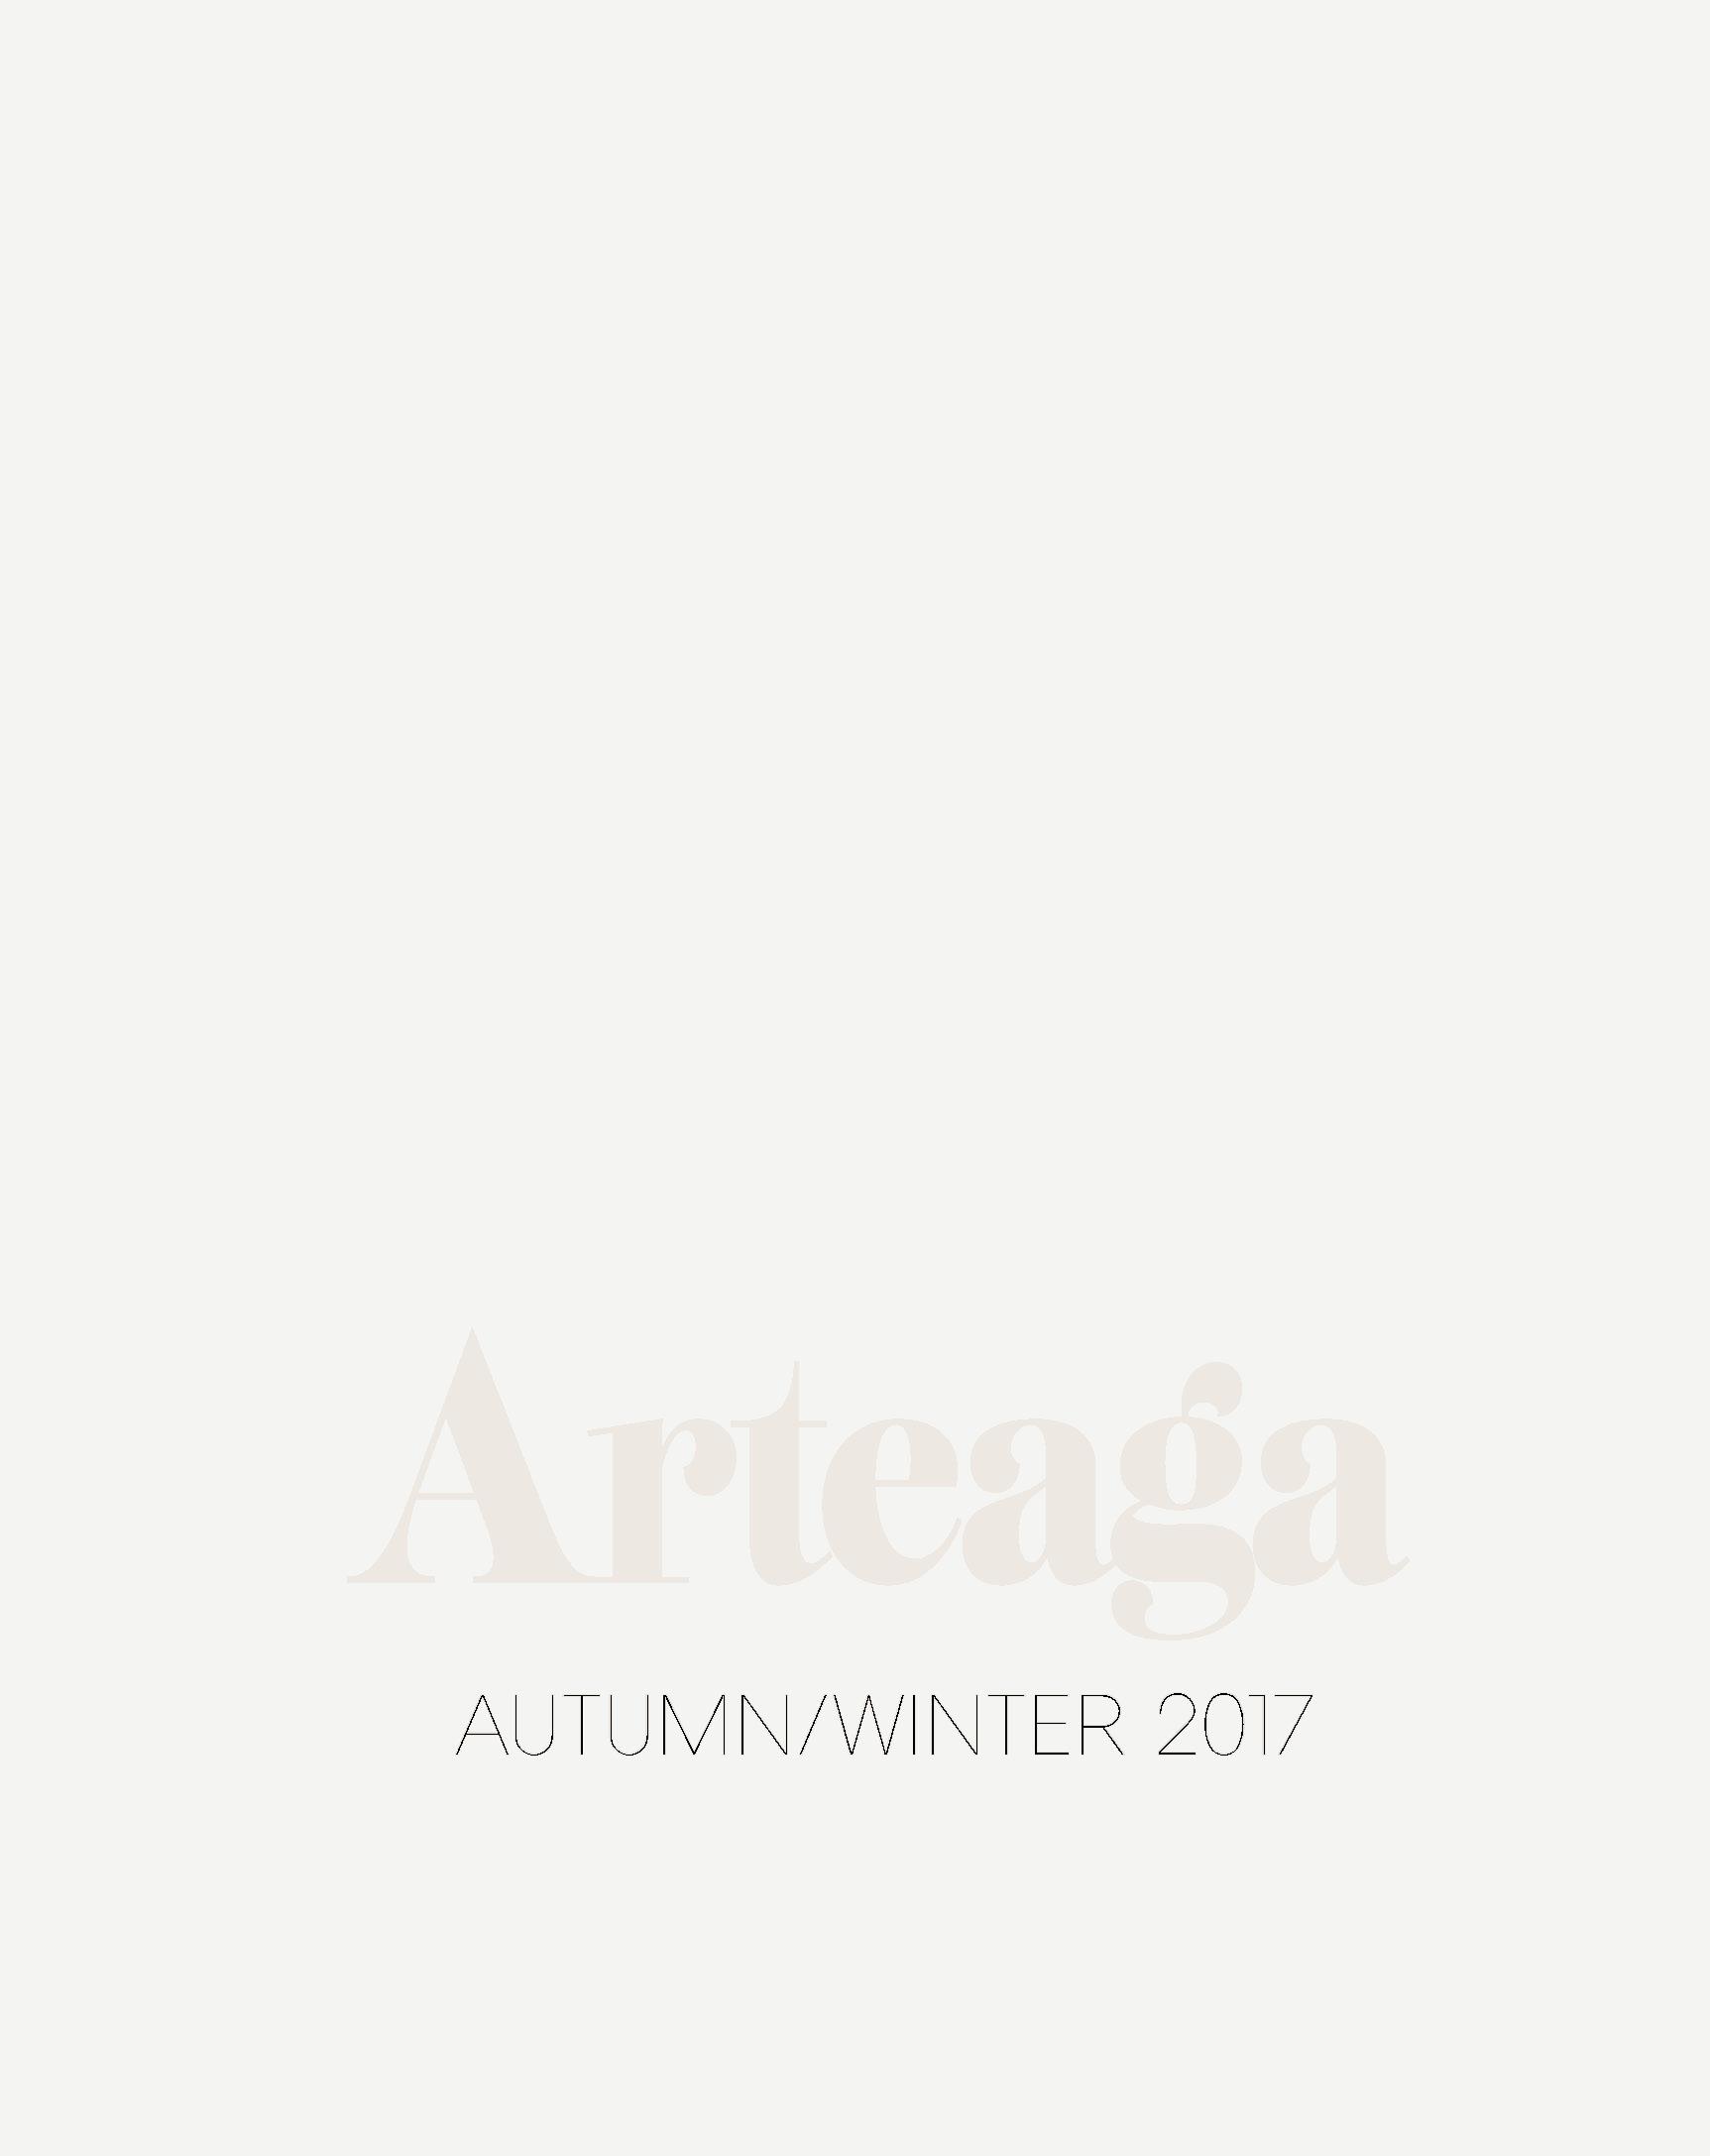 Arteaga AW 2017 Lookbook.jpg